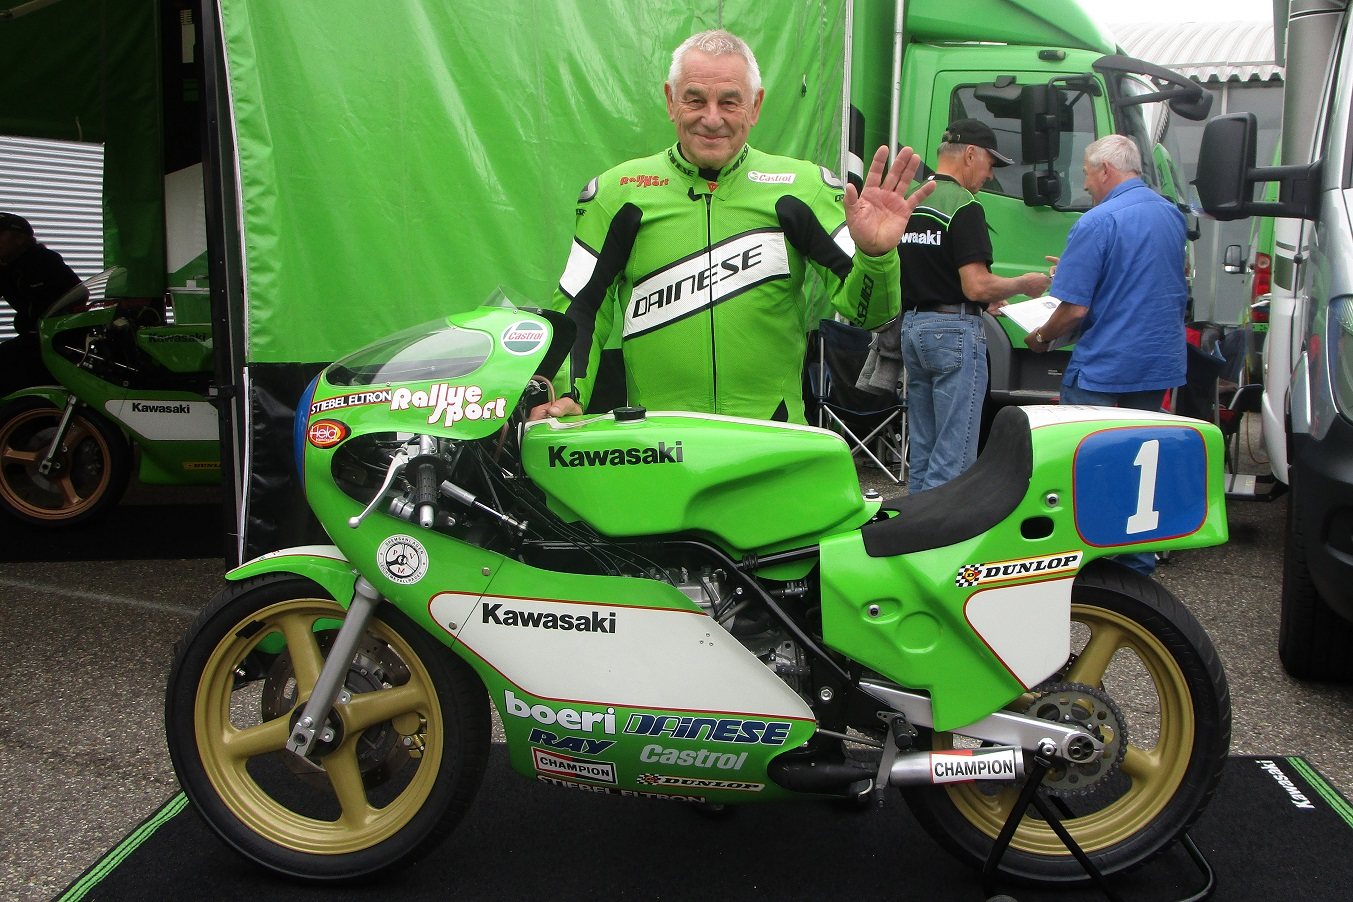 Toni Mang mit seiner Kawasaki - Foto: Michael Sonnick